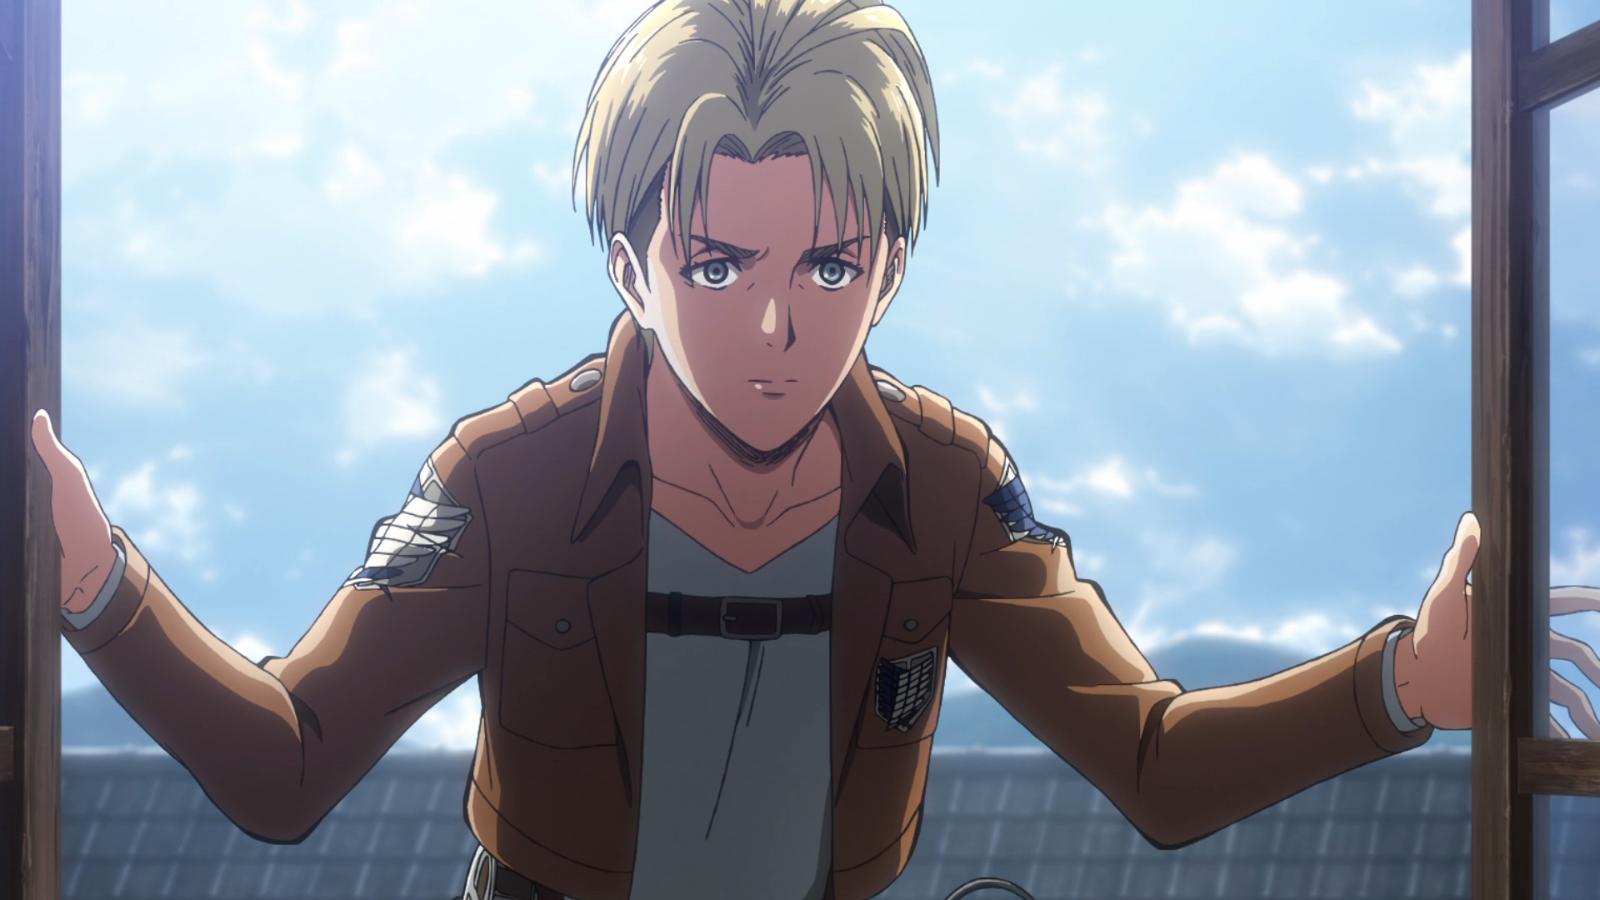 Nanaba (Attack on Titan) | AnimeVice Wiki | FANDOM powered ...